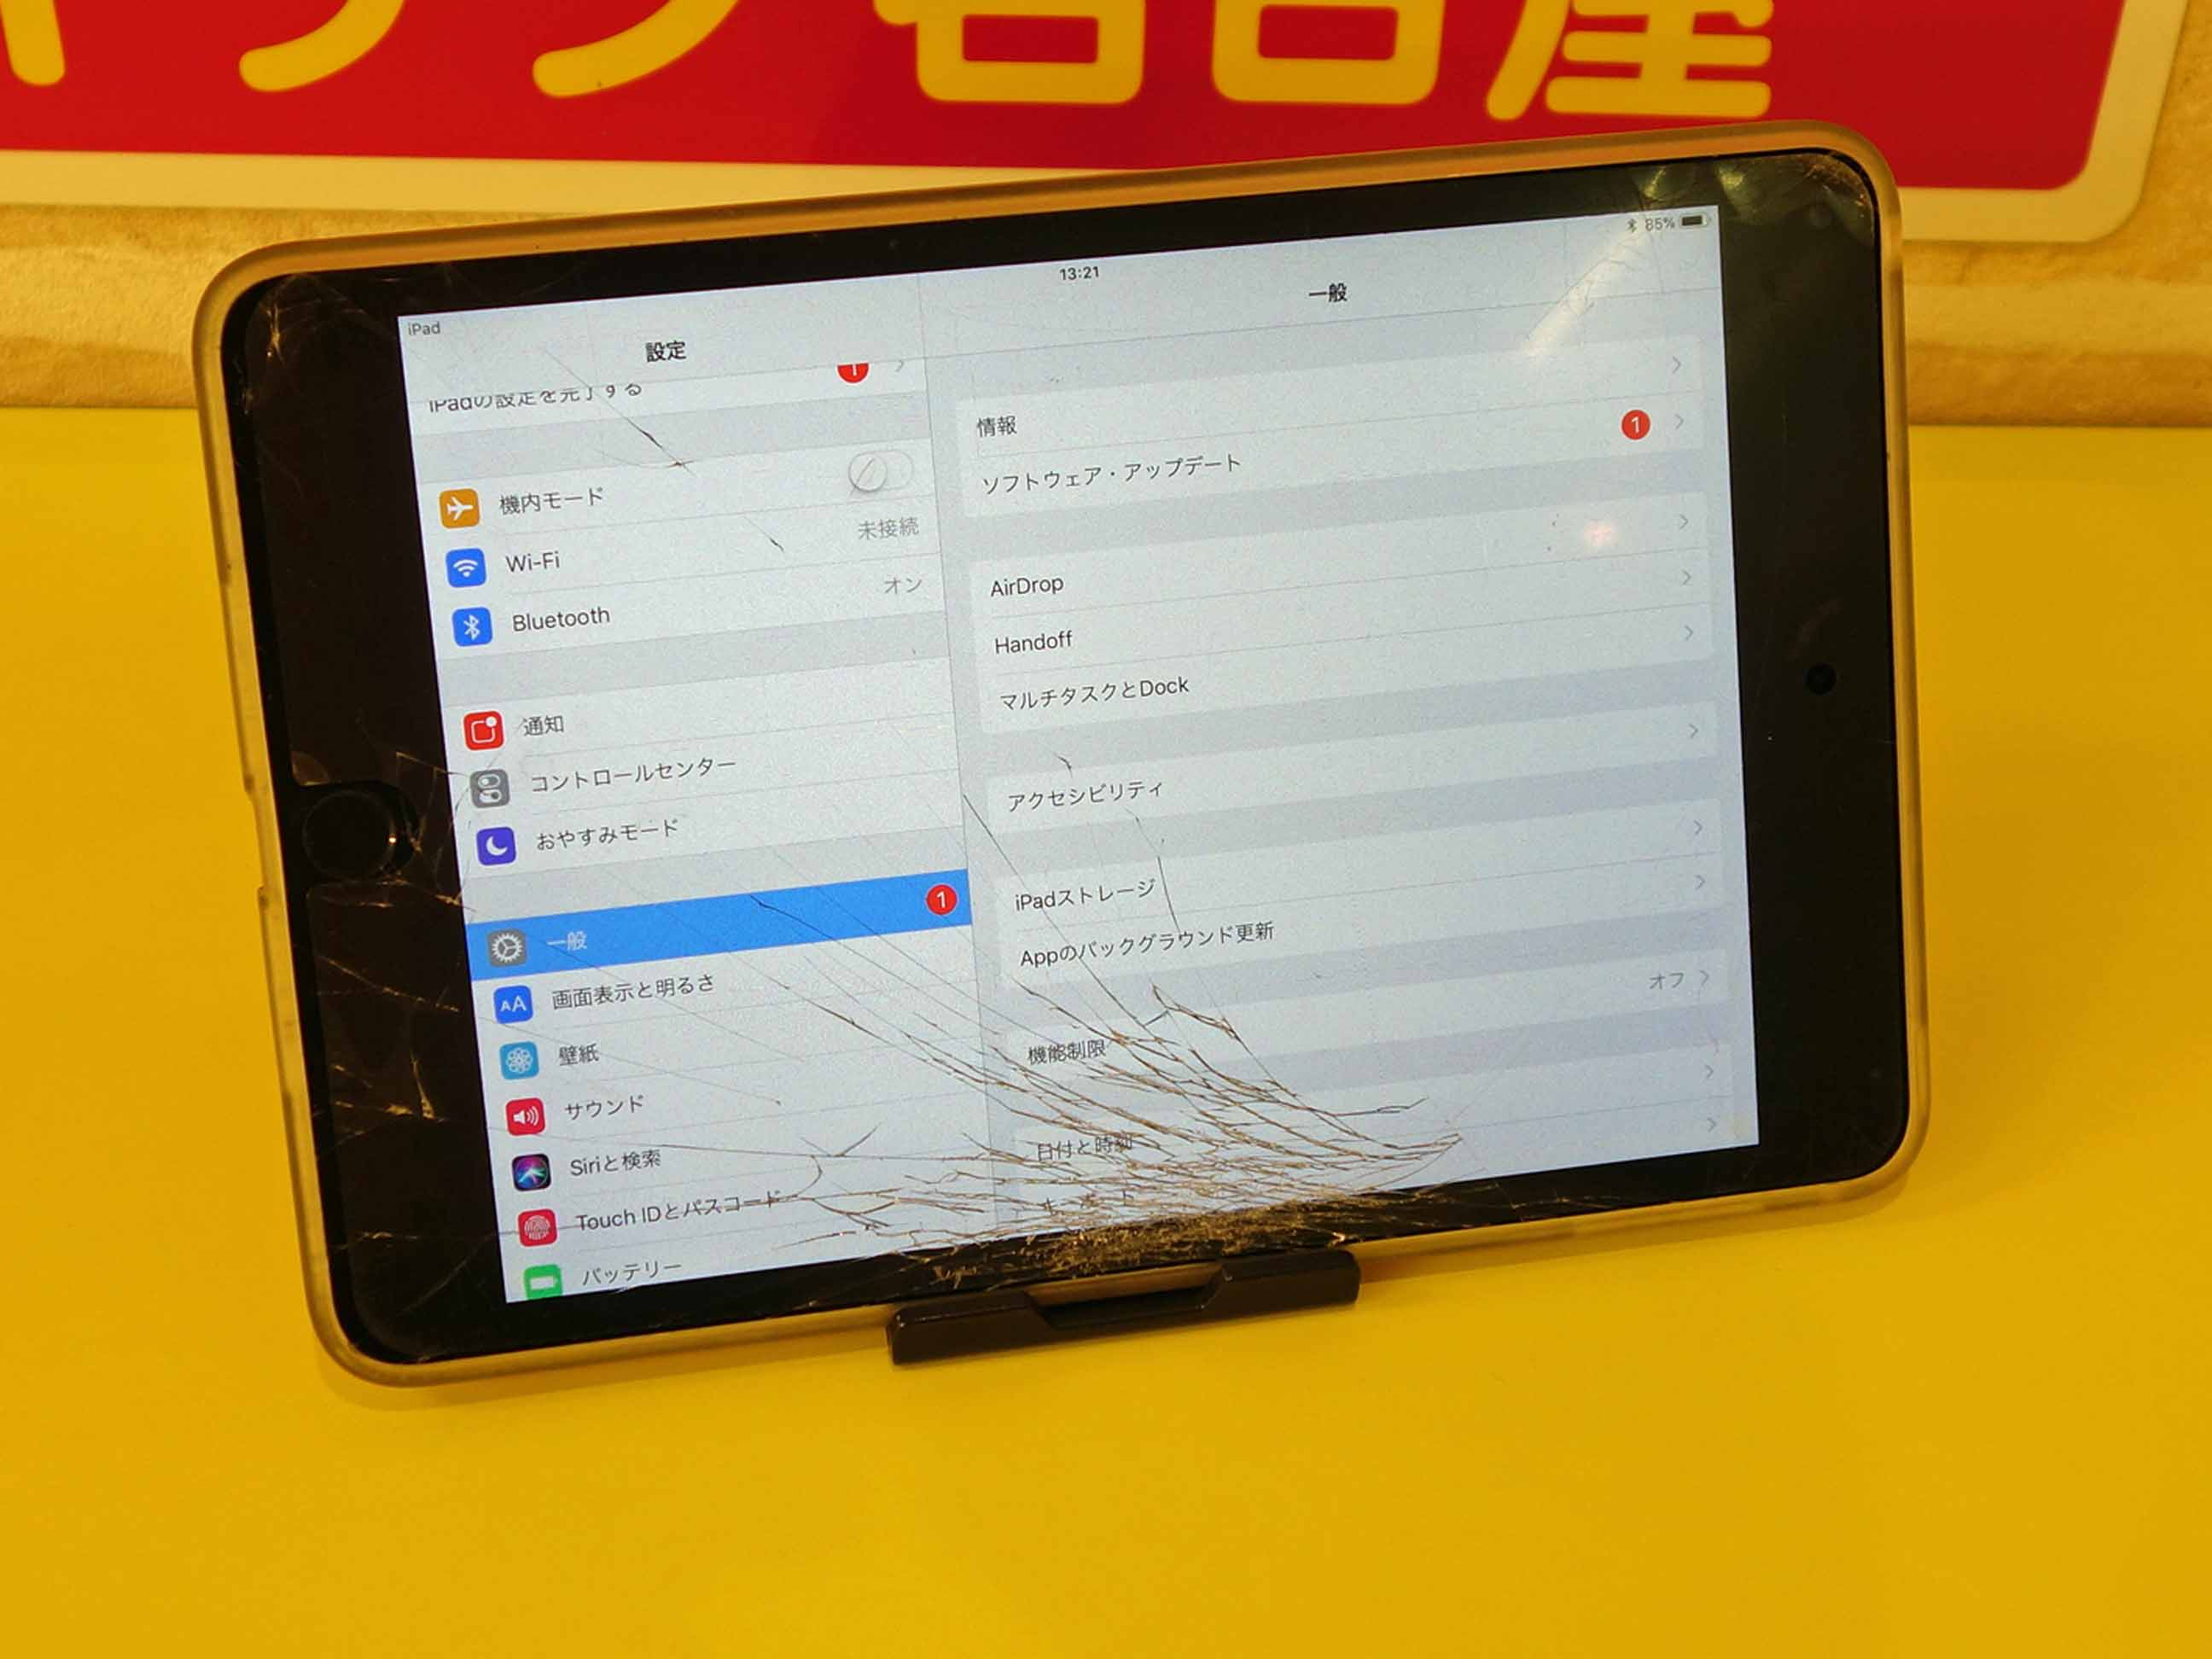 iPadmini4のガラス交換修理にあま市よりご来店!アイパッド修理もクイック名古屋